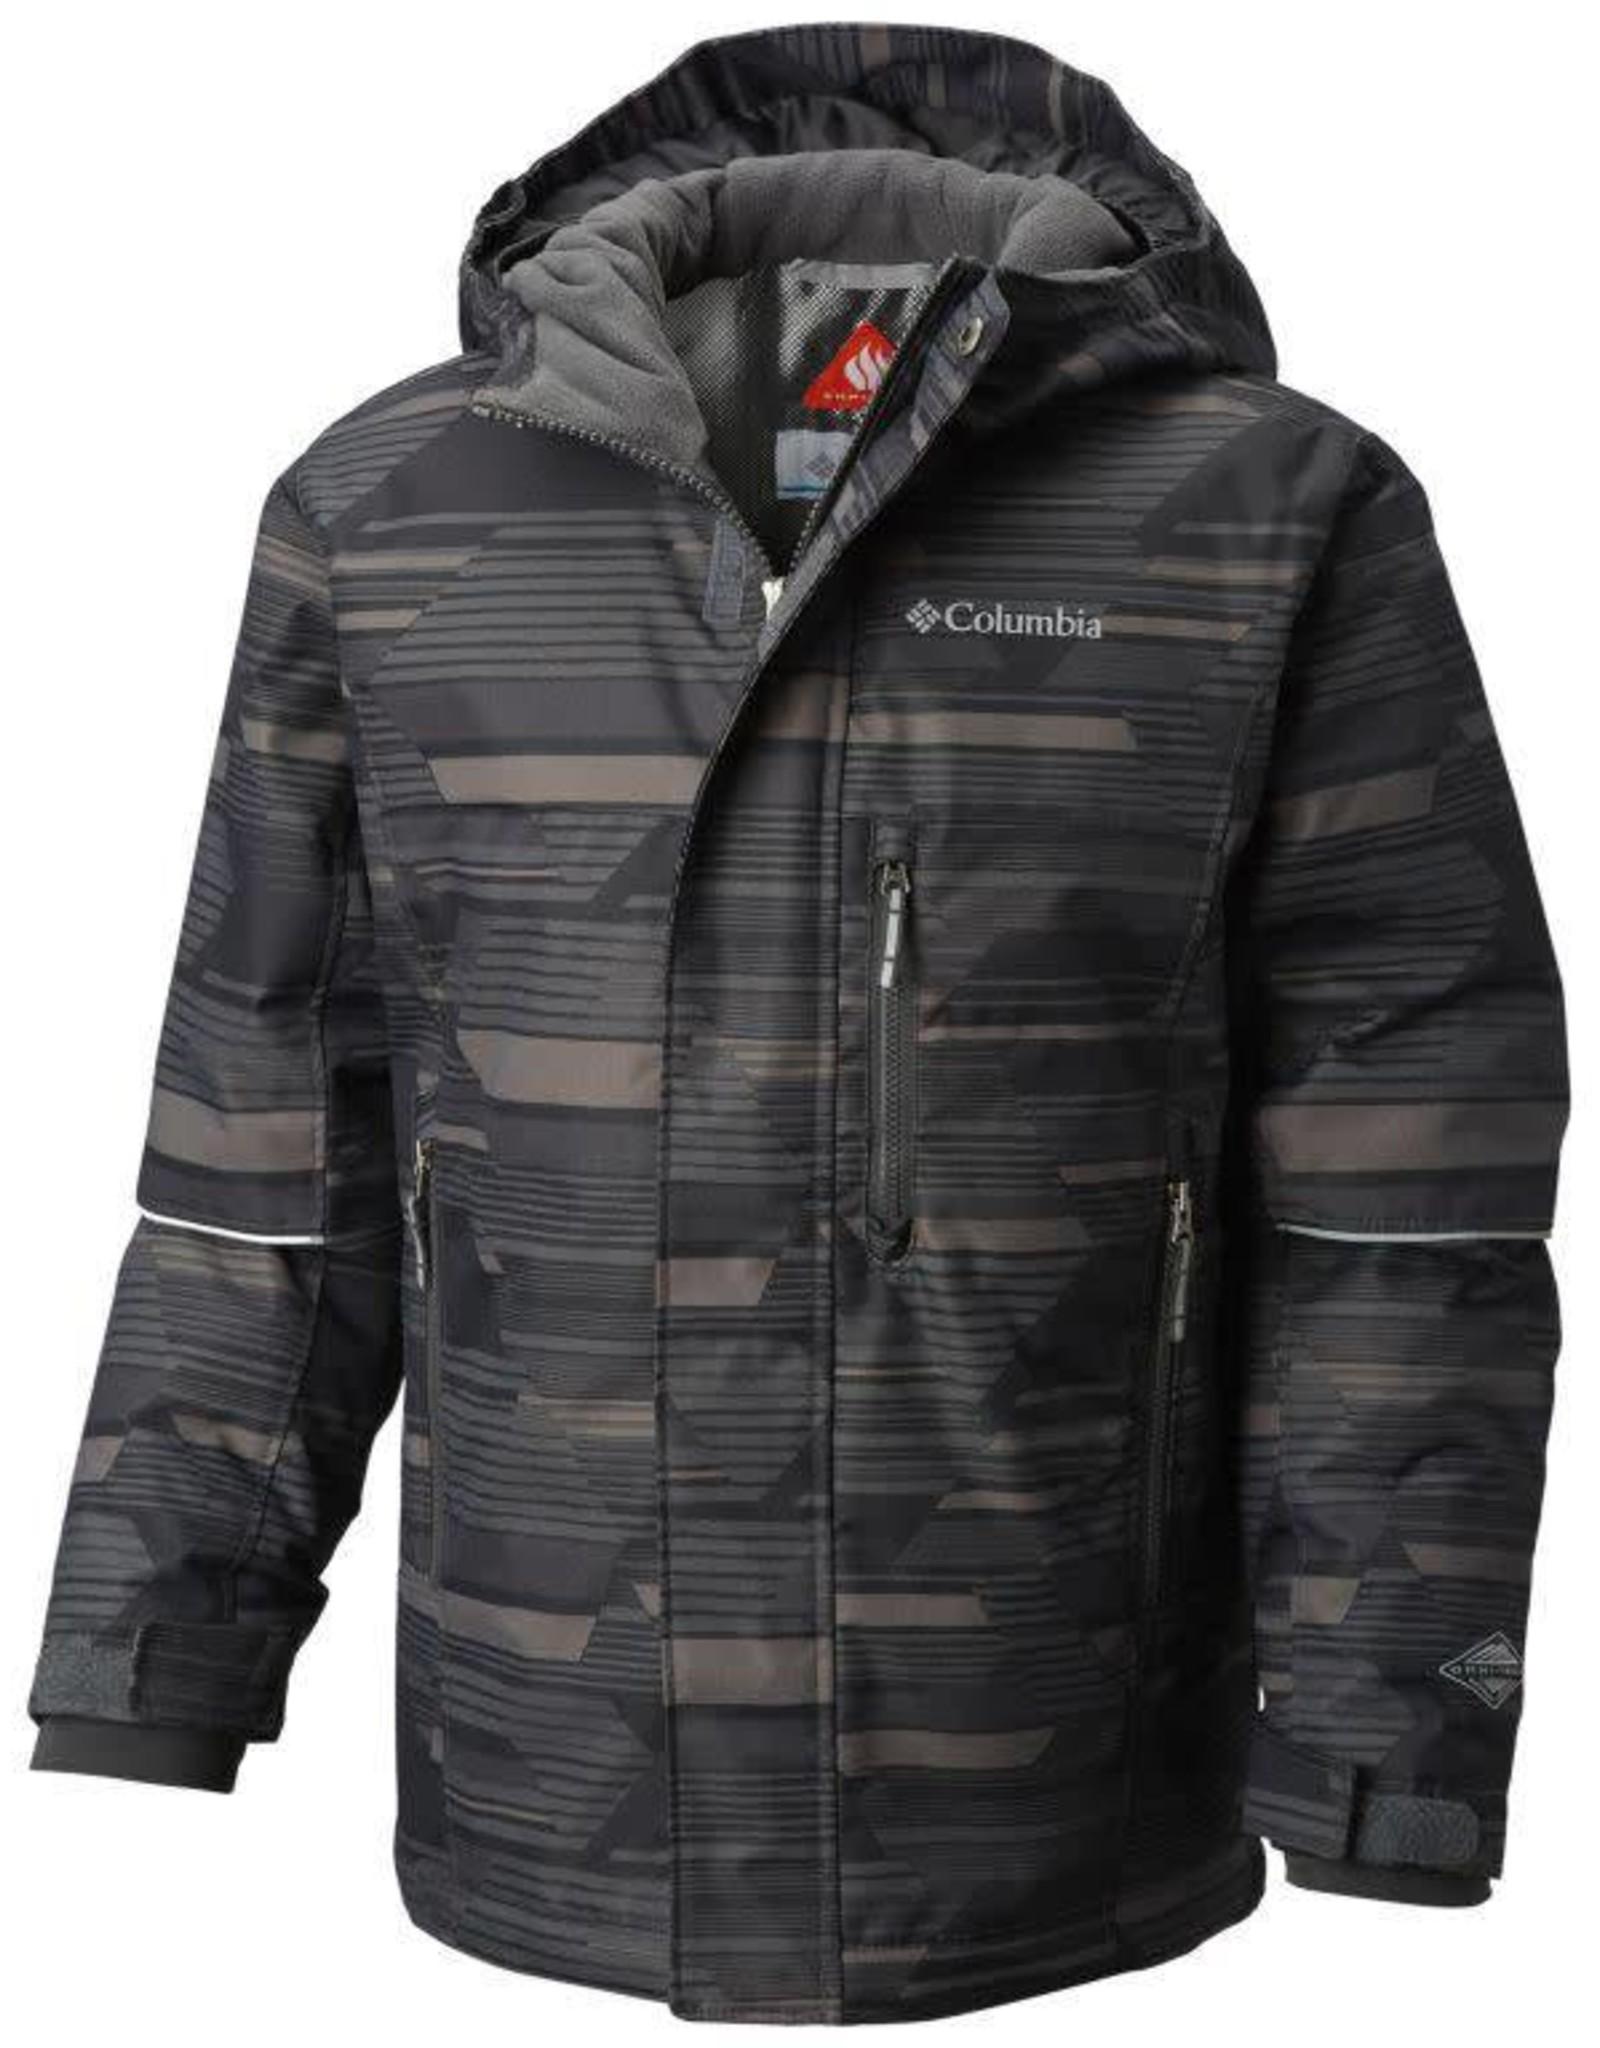 Columbia Sportswear Columbia Mighty Mogul Jacket F18